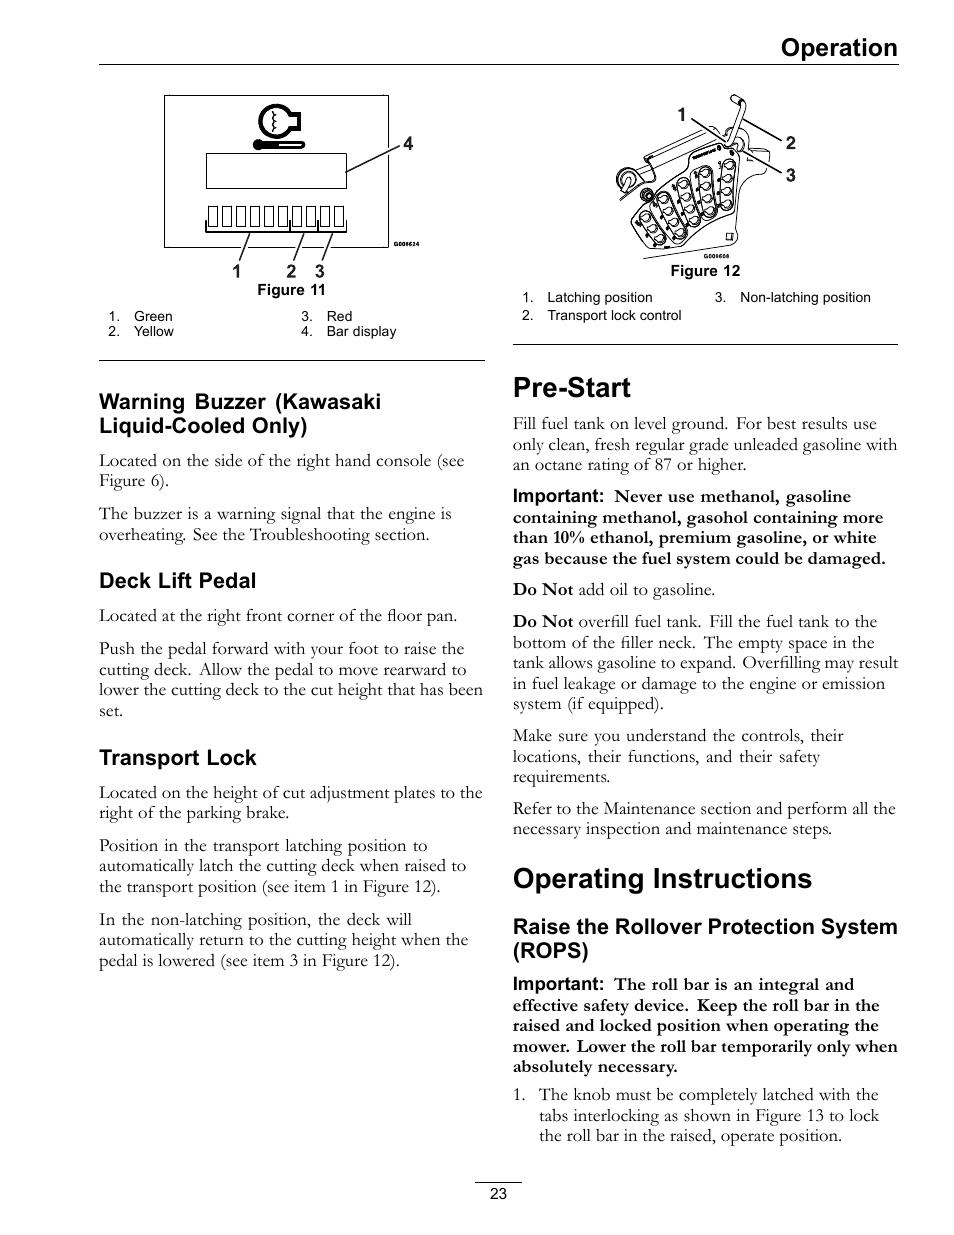 Pre-start operating instructions, Pre-start, Operating